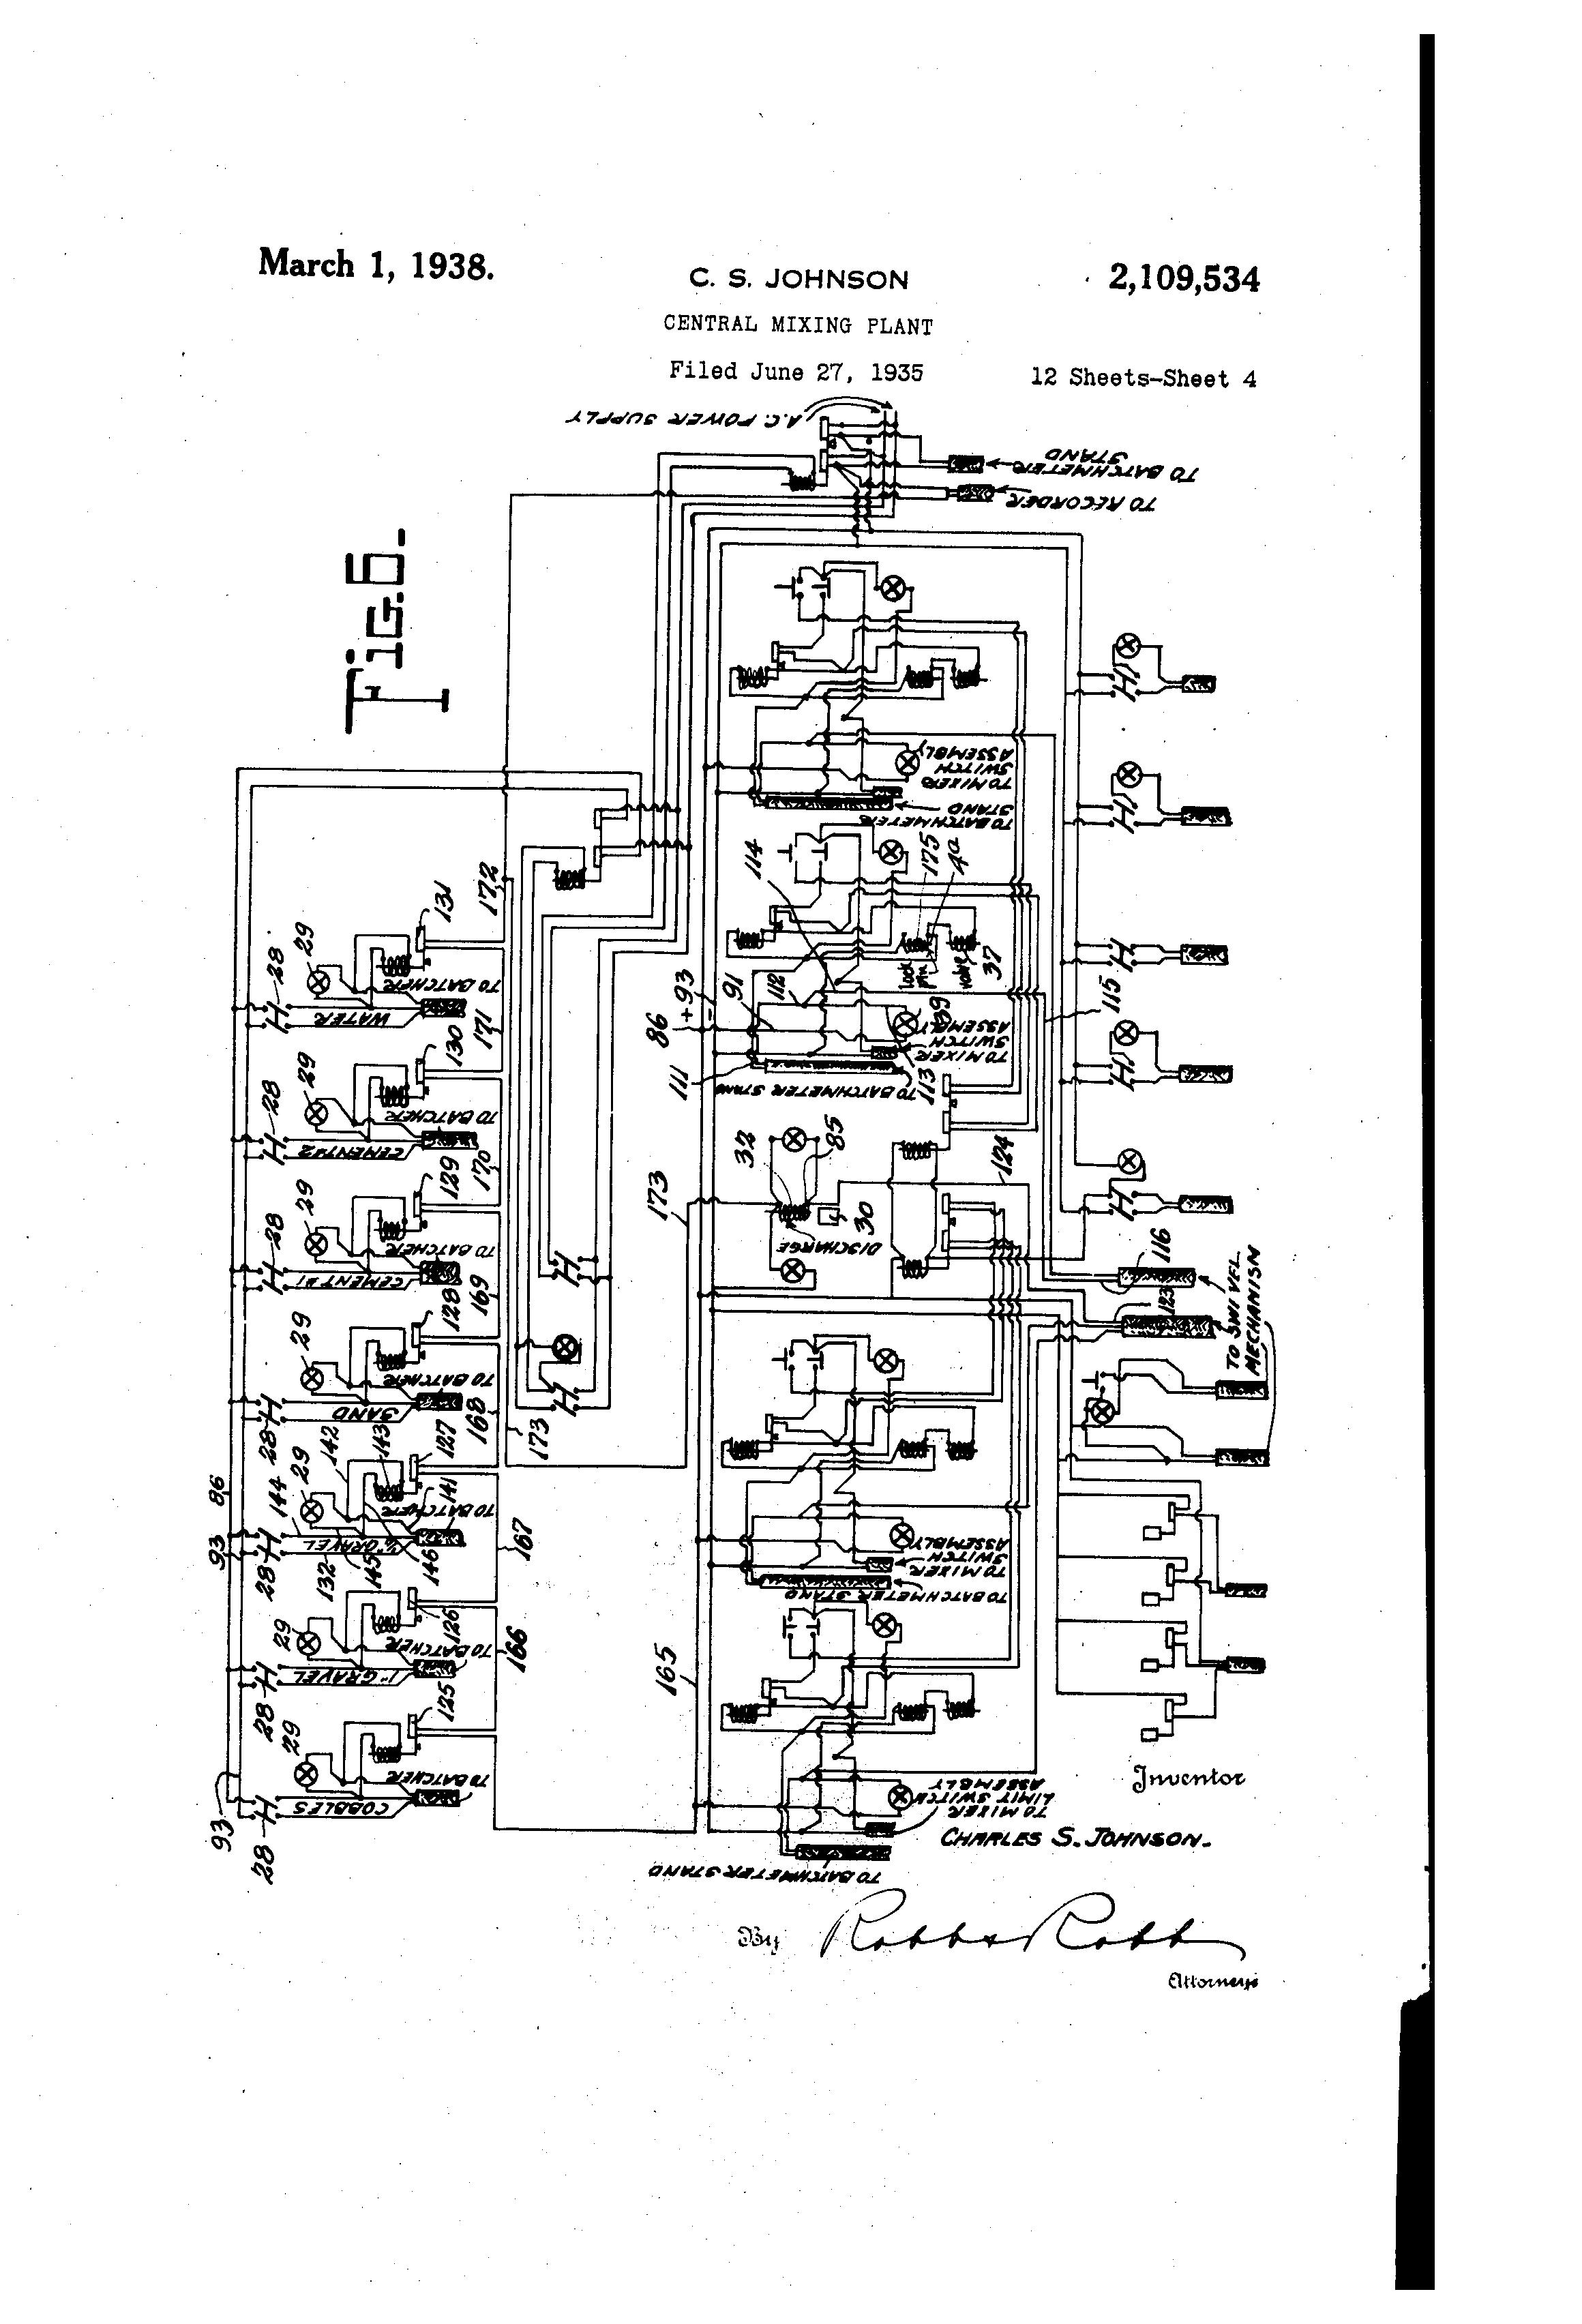 massey harris wiring diagrams mcneilus wiring diagrams wiring diagram data  mcneilus wiring diagrams wiring